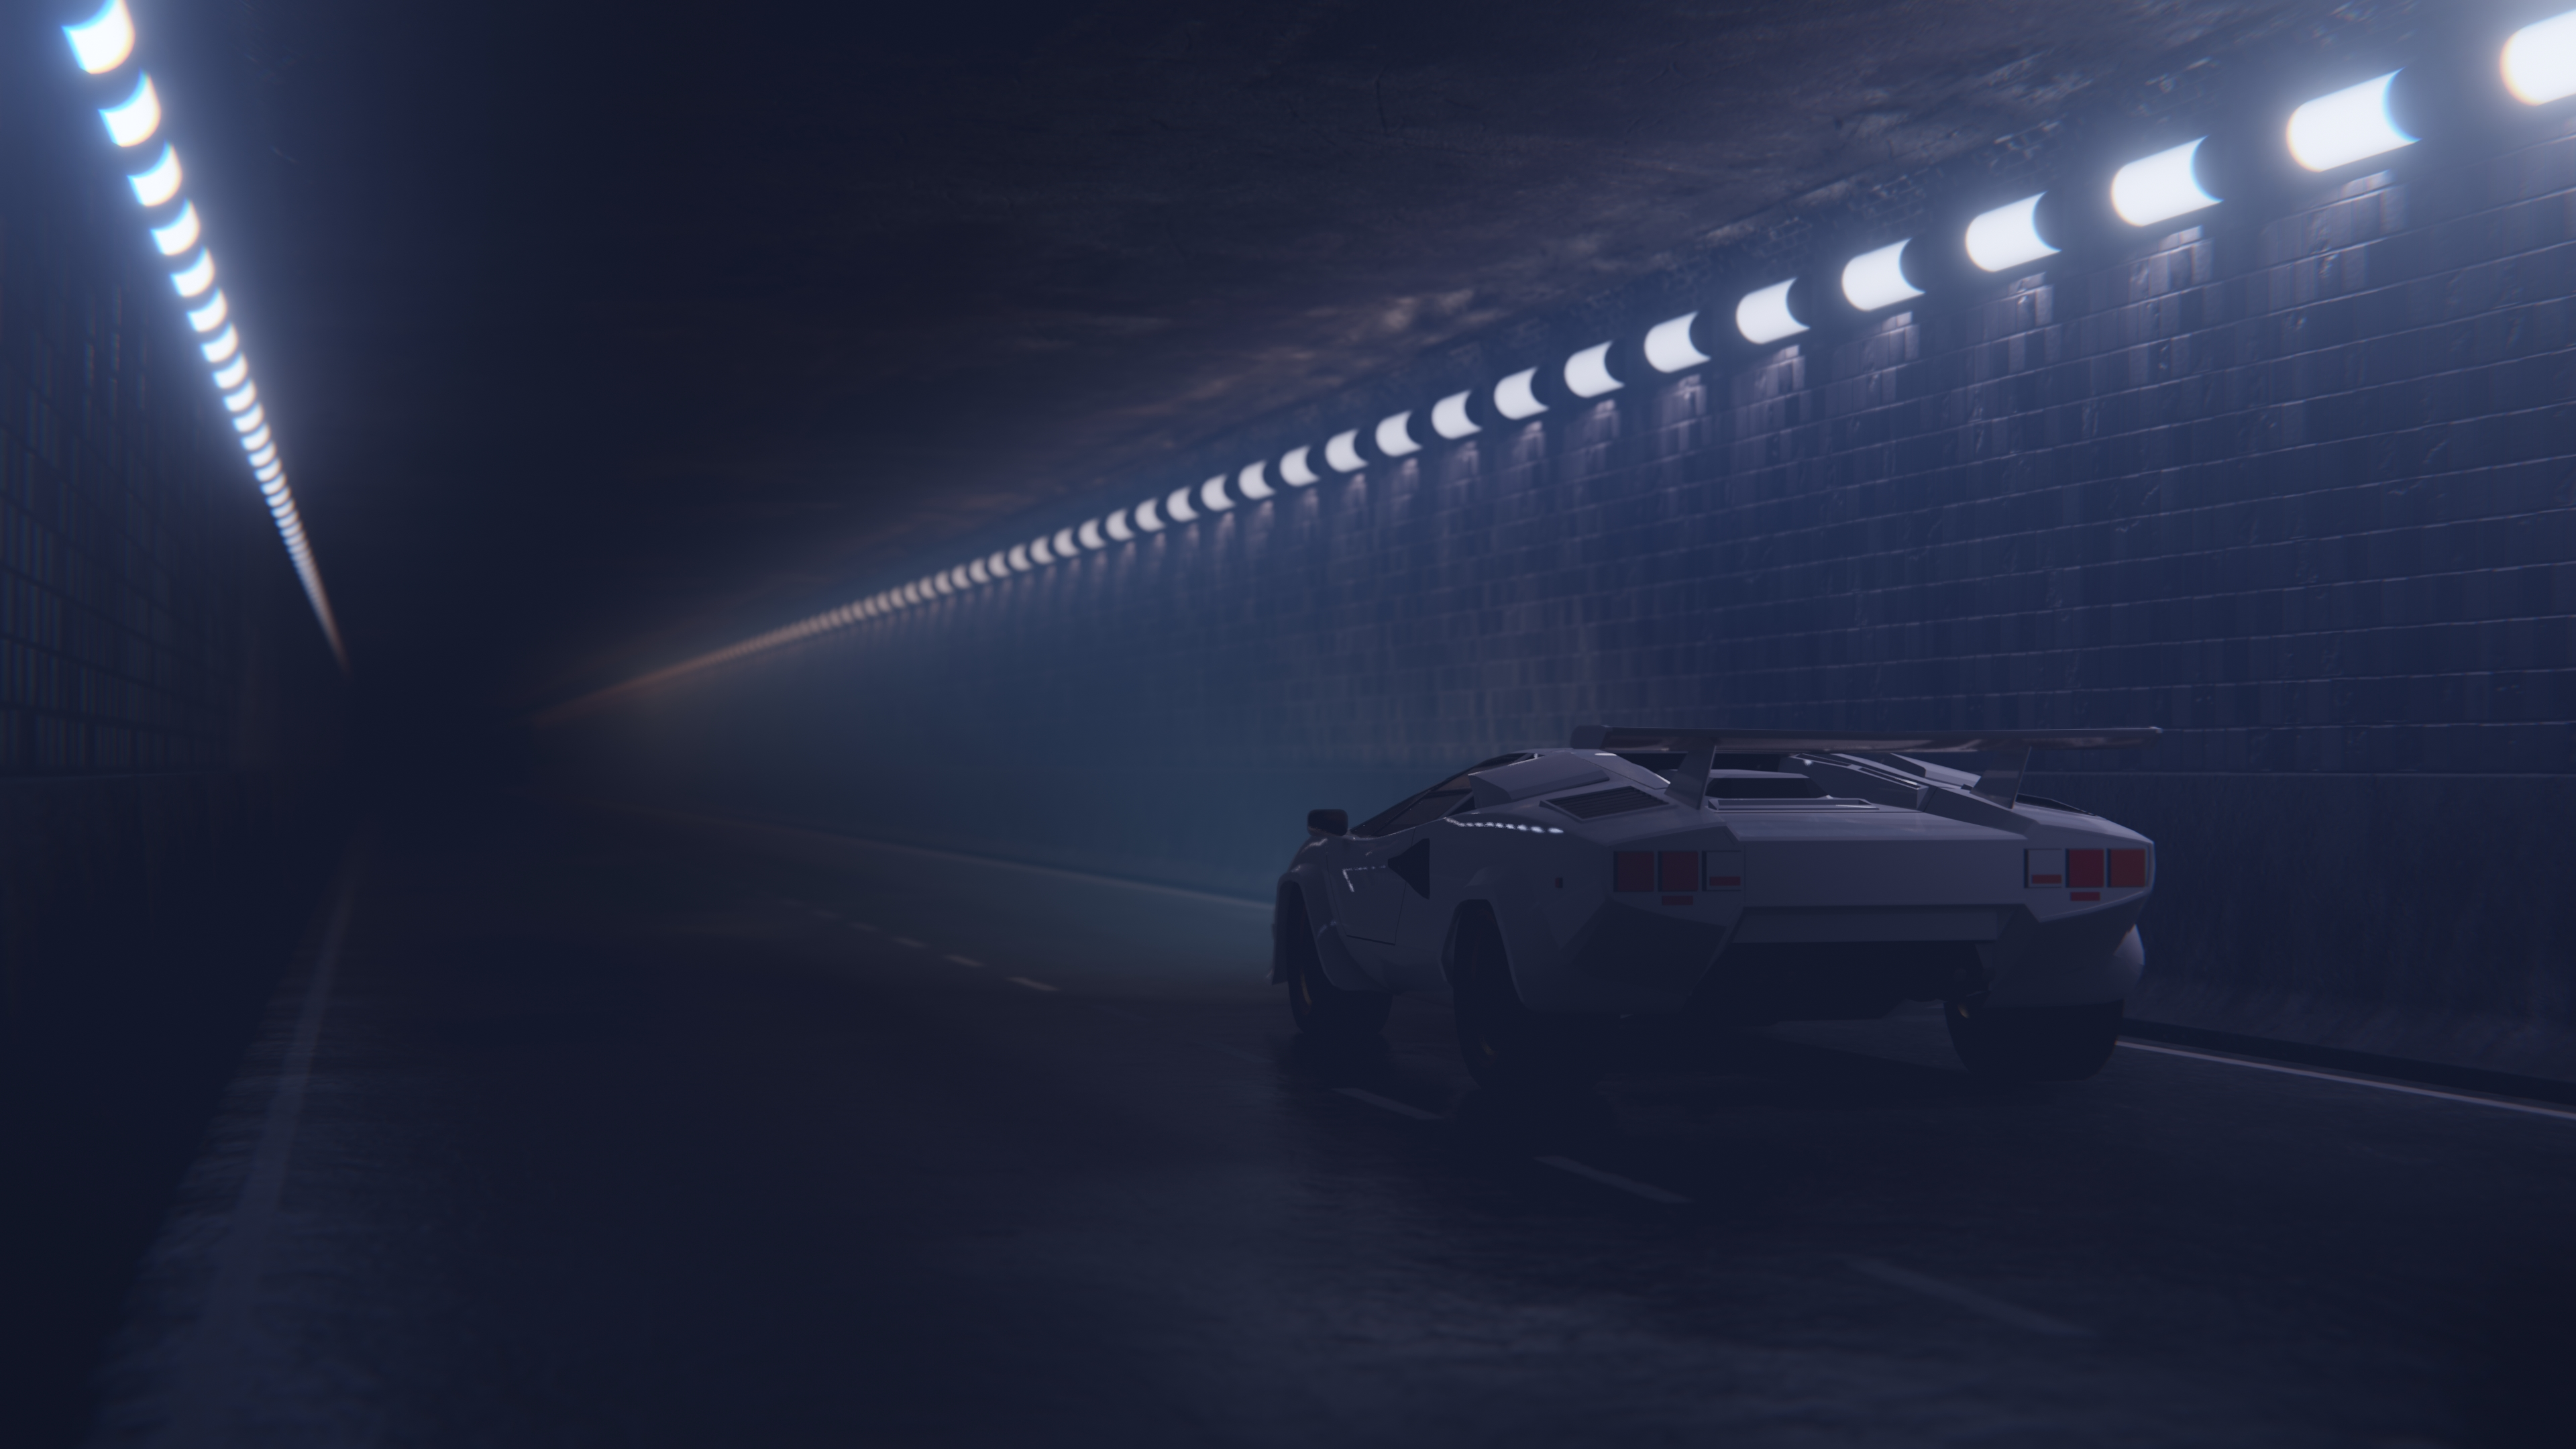 foggy tunnel lamborghini 1570919174 - Foggy Tunnel Lamborghini - lamborghini wallpapers, hd-wallpapers, digital art wallpapers, deviantart wallpapers, cars wallpapers, artwork wallpapers, artist wallpapers, 4k-wallpapers